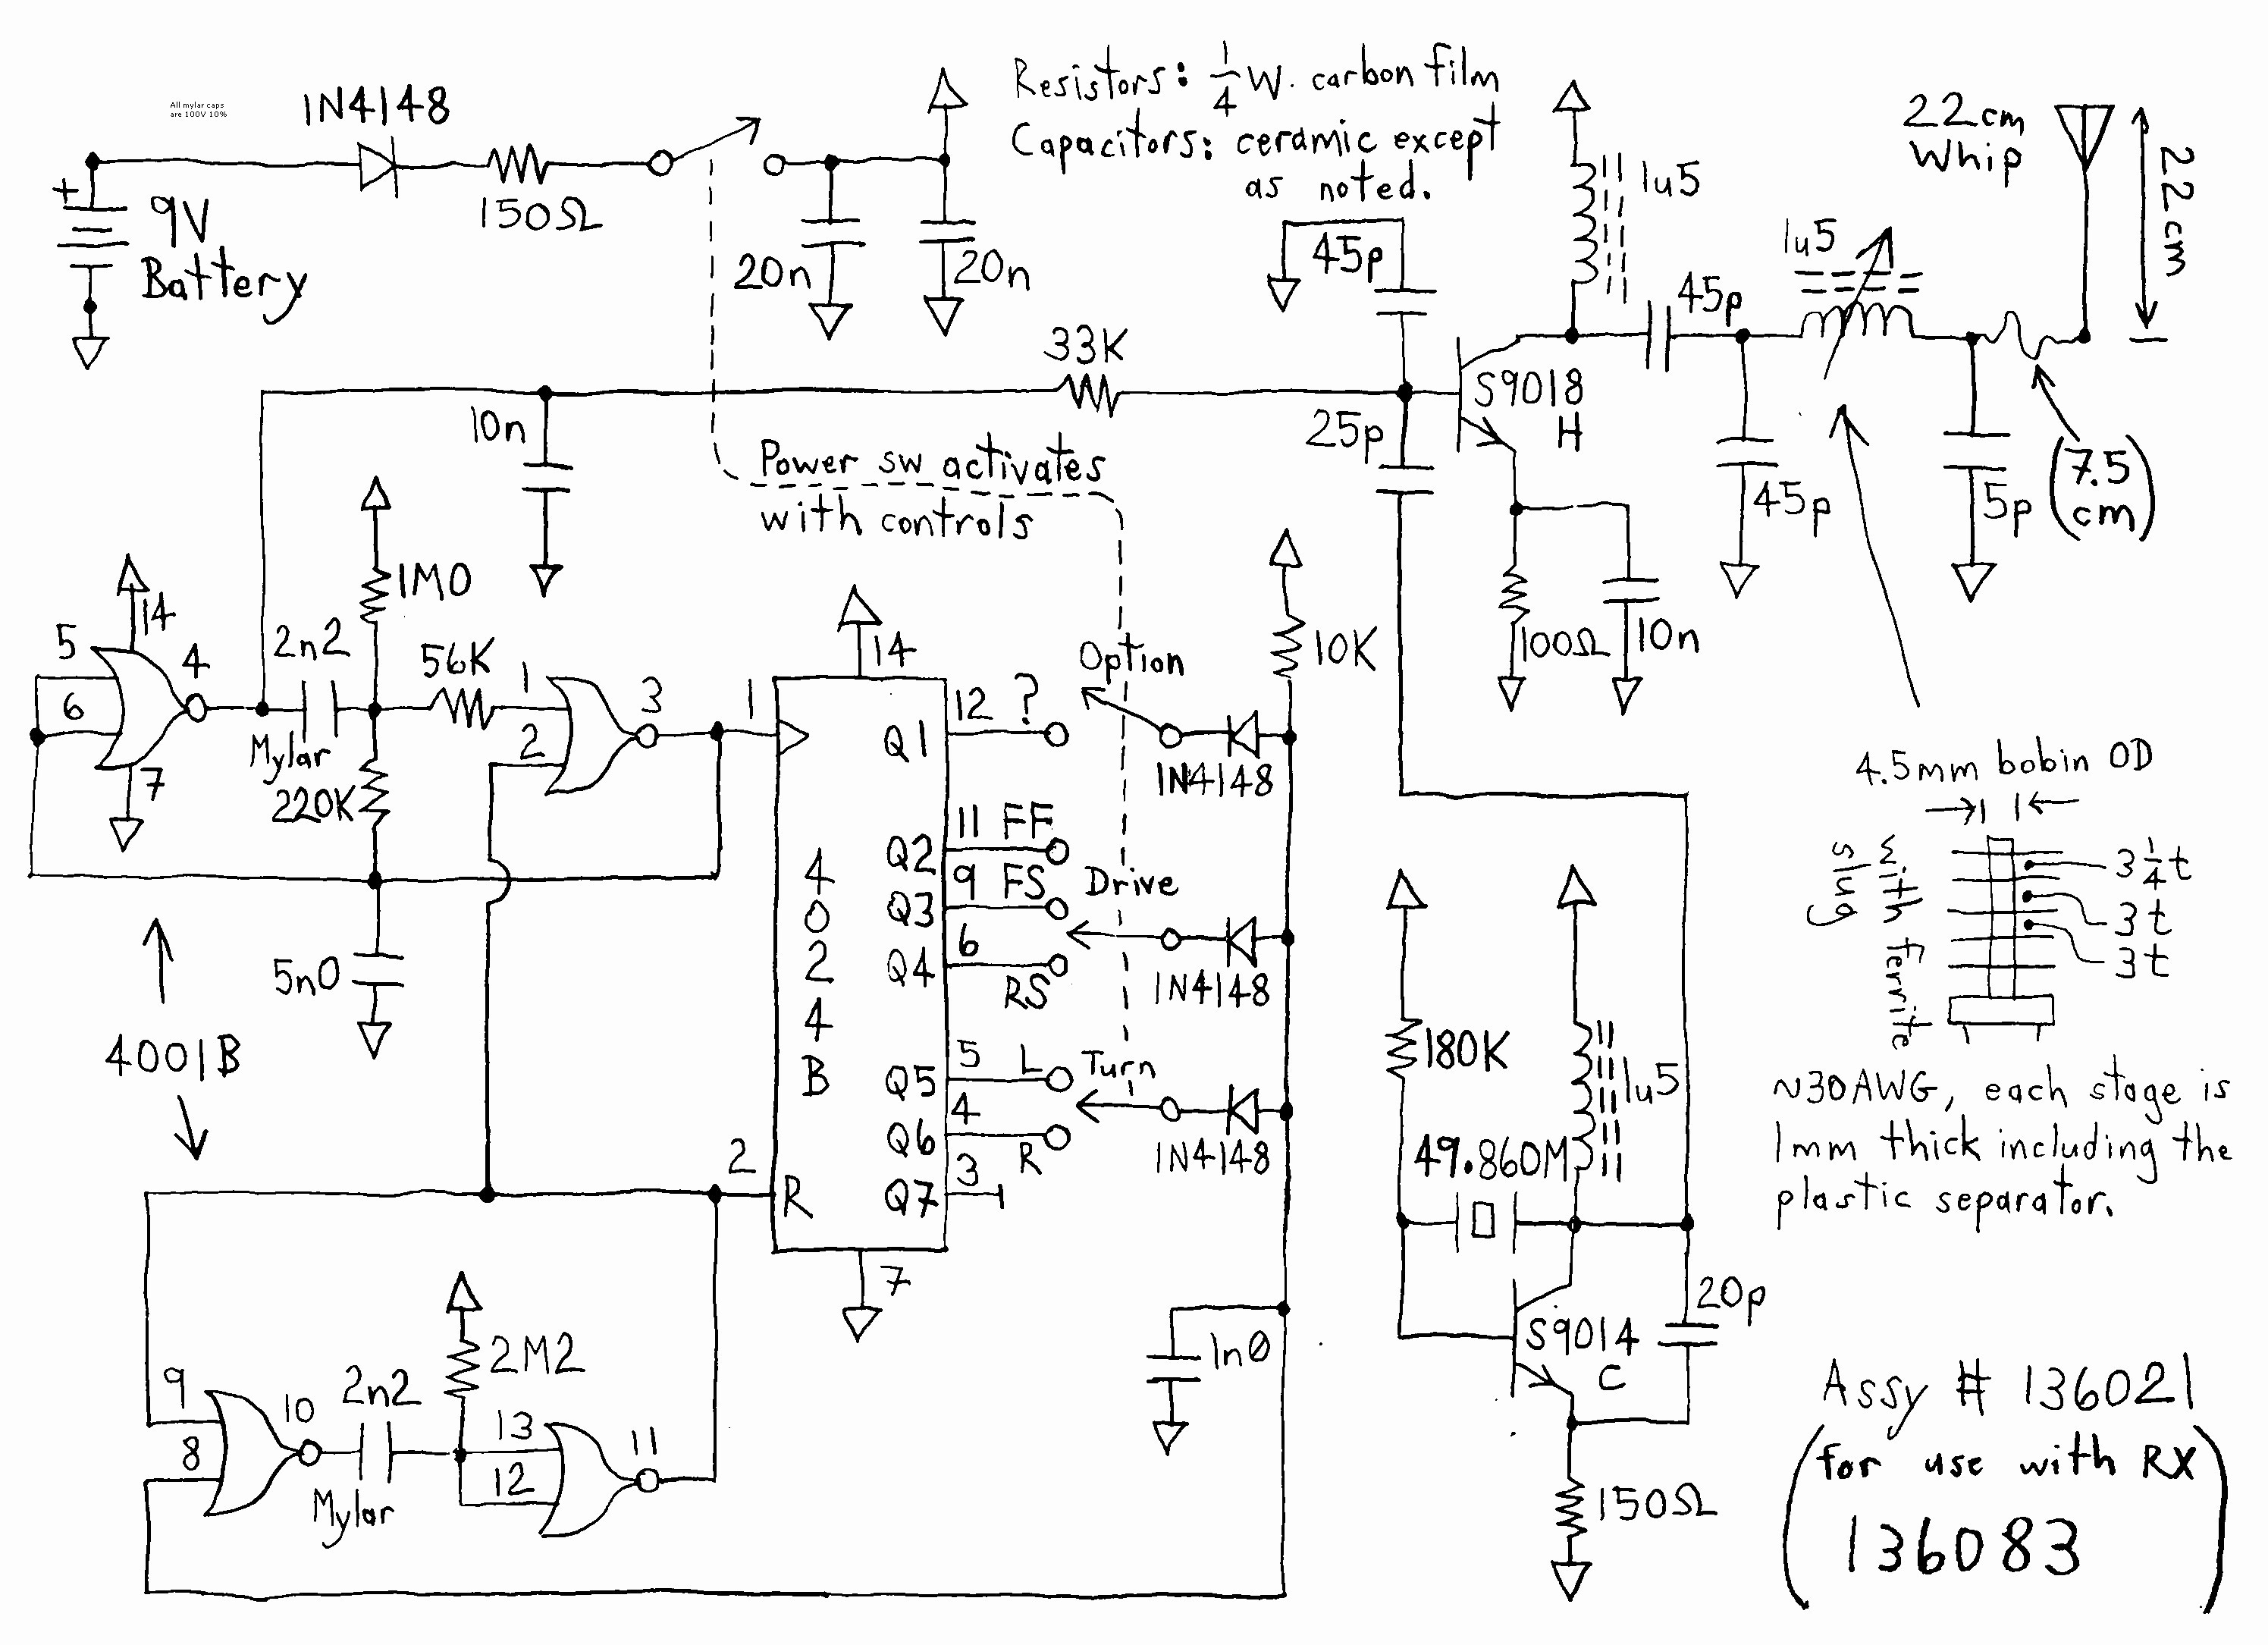 Remote Control Car Circuit Diagram Circuit Board Wiring Diagram for Rc Of Remote Control Car Circuit Diagram